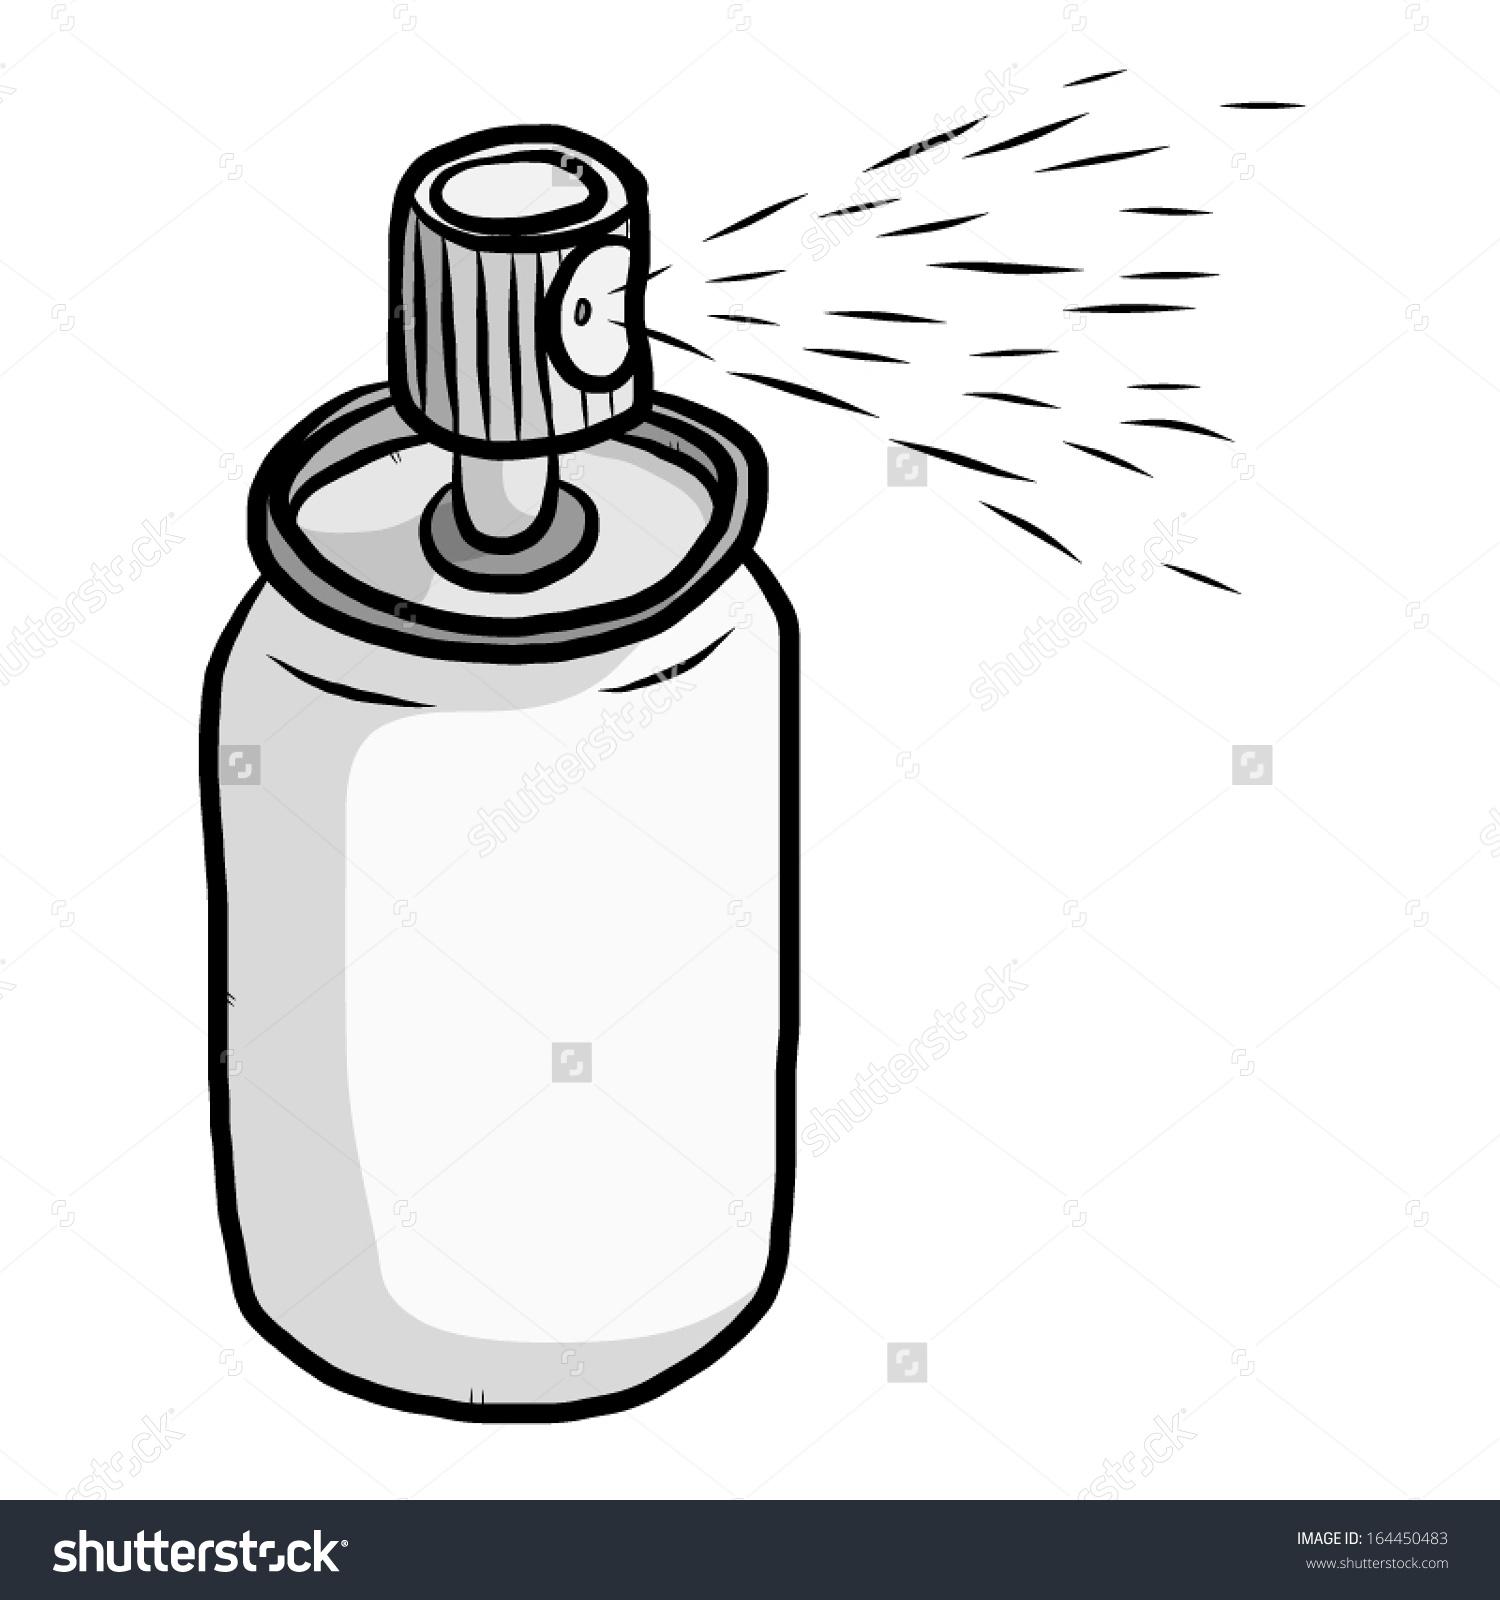 Water spray bottle clipart.